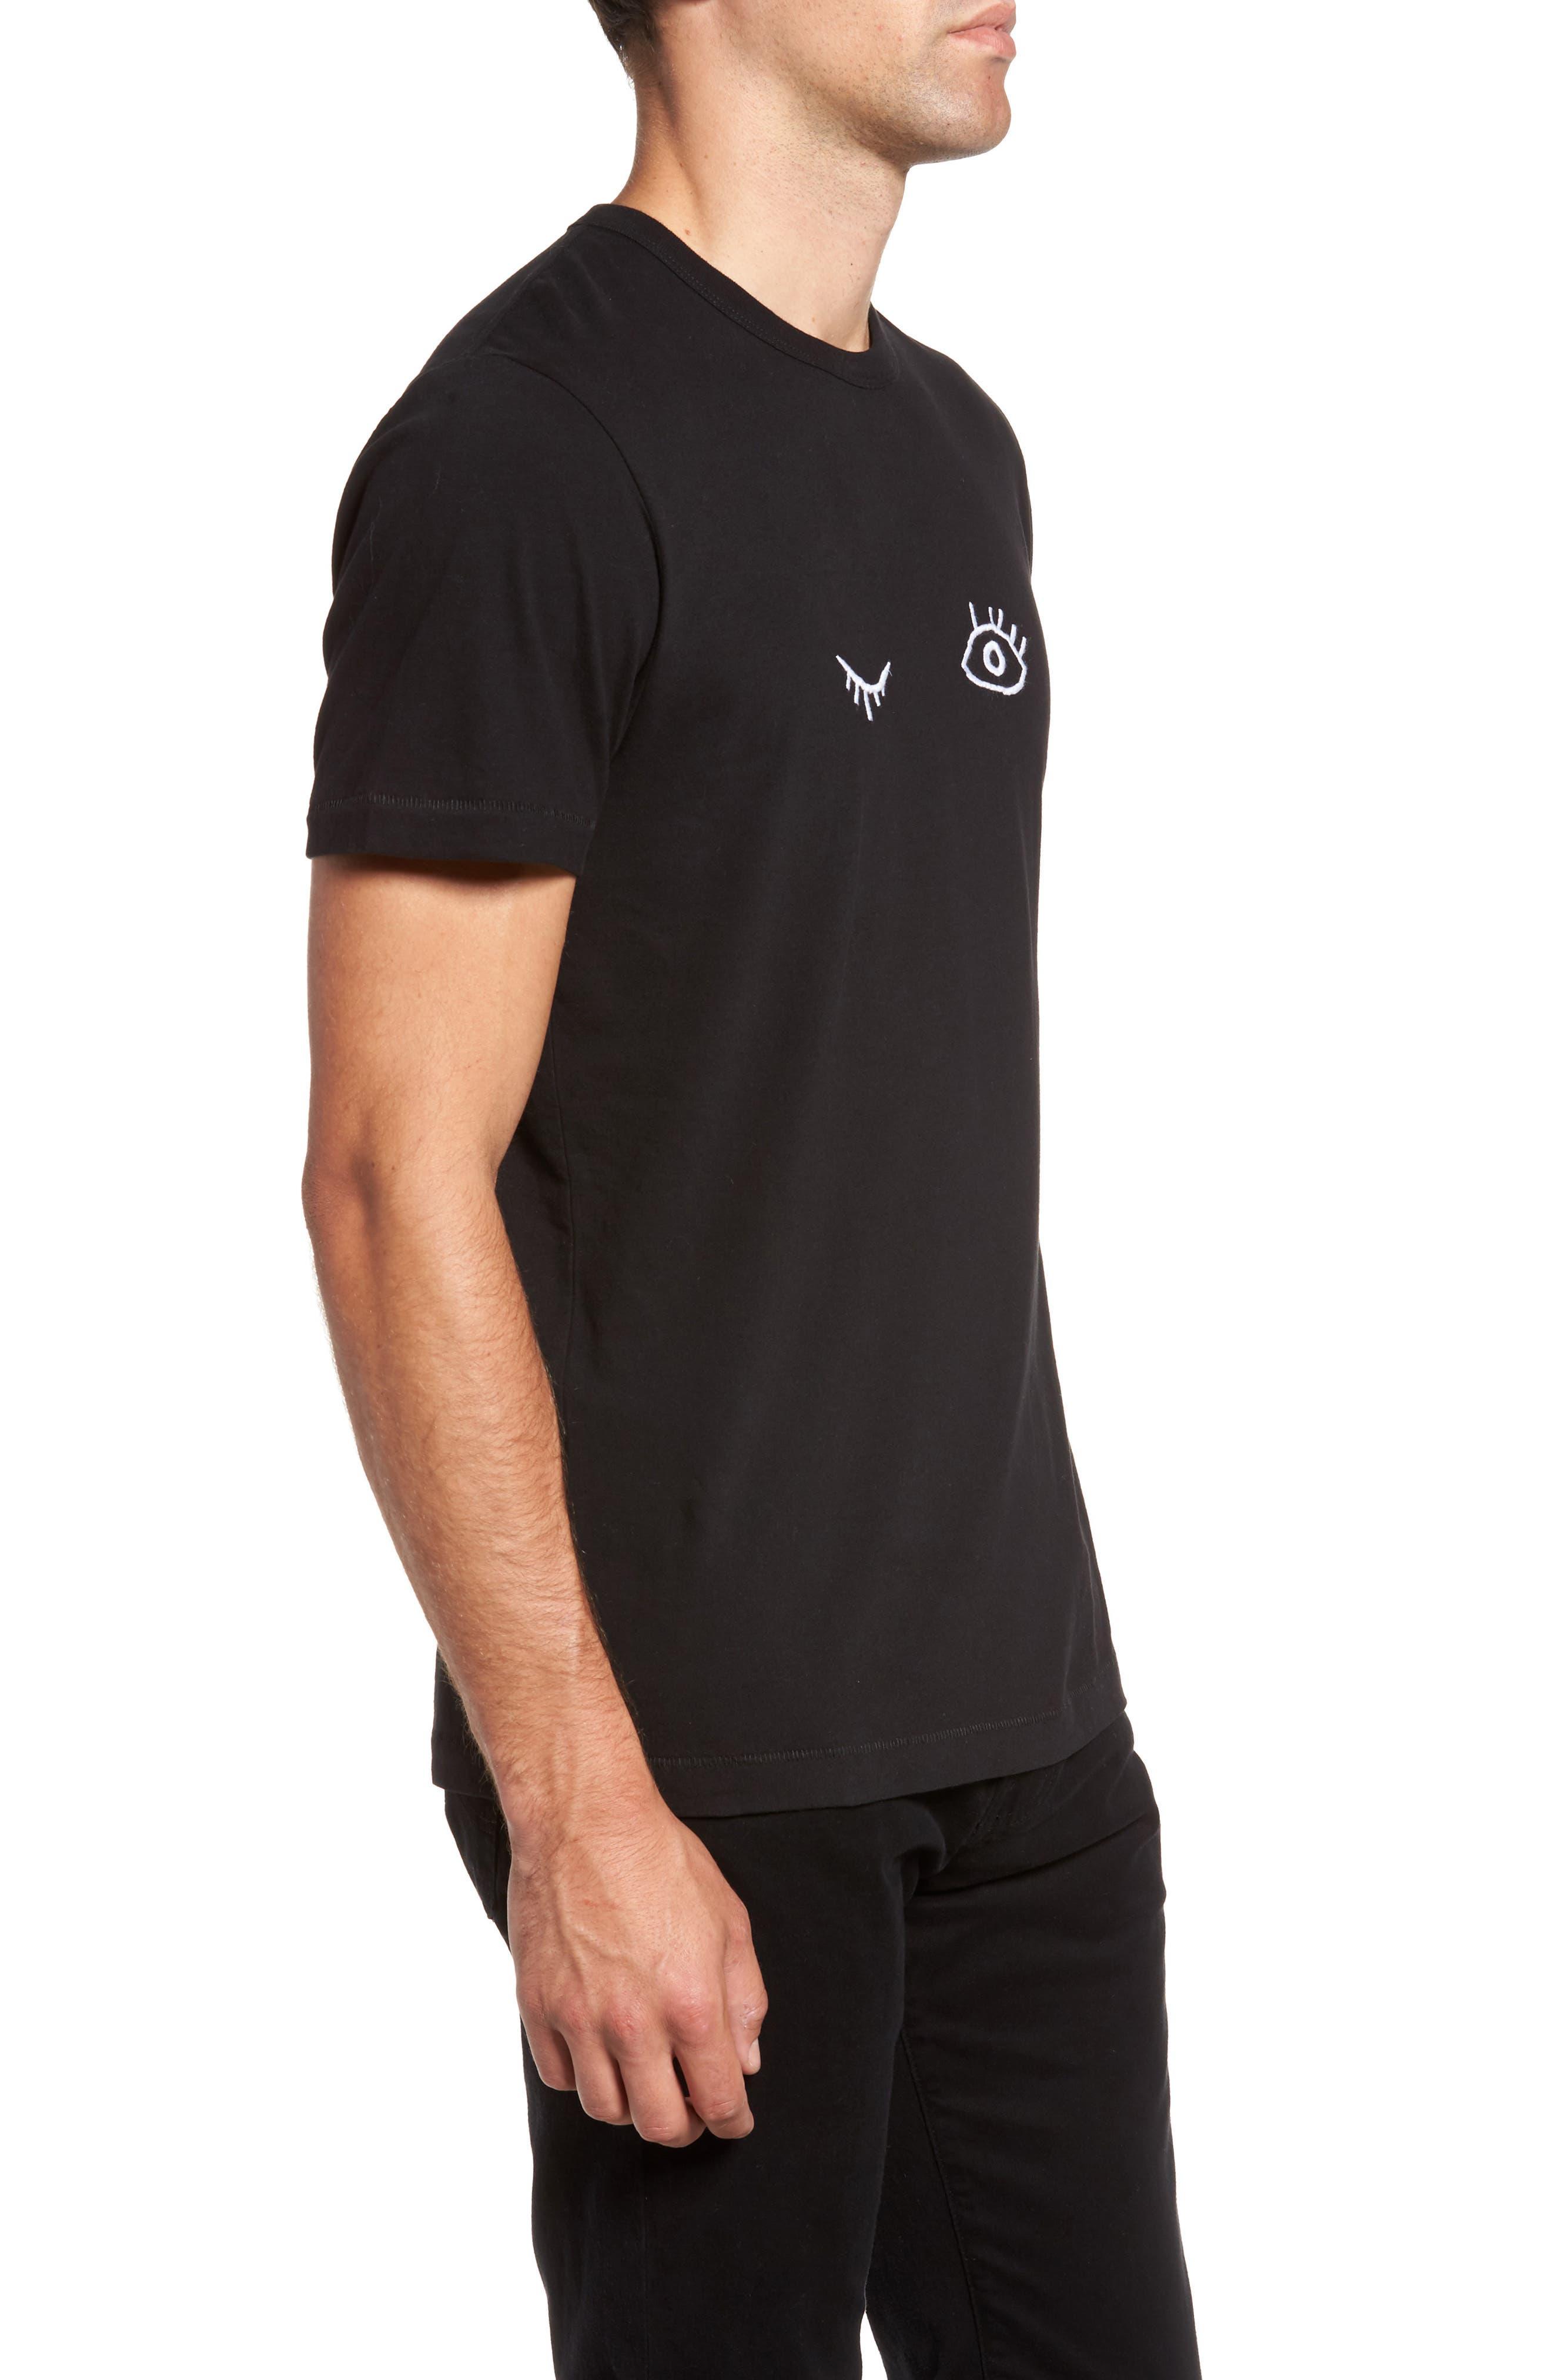 Wink Regular Fit T-Shirt,                             Alternate thumbnail 3, color,                             Black/ White